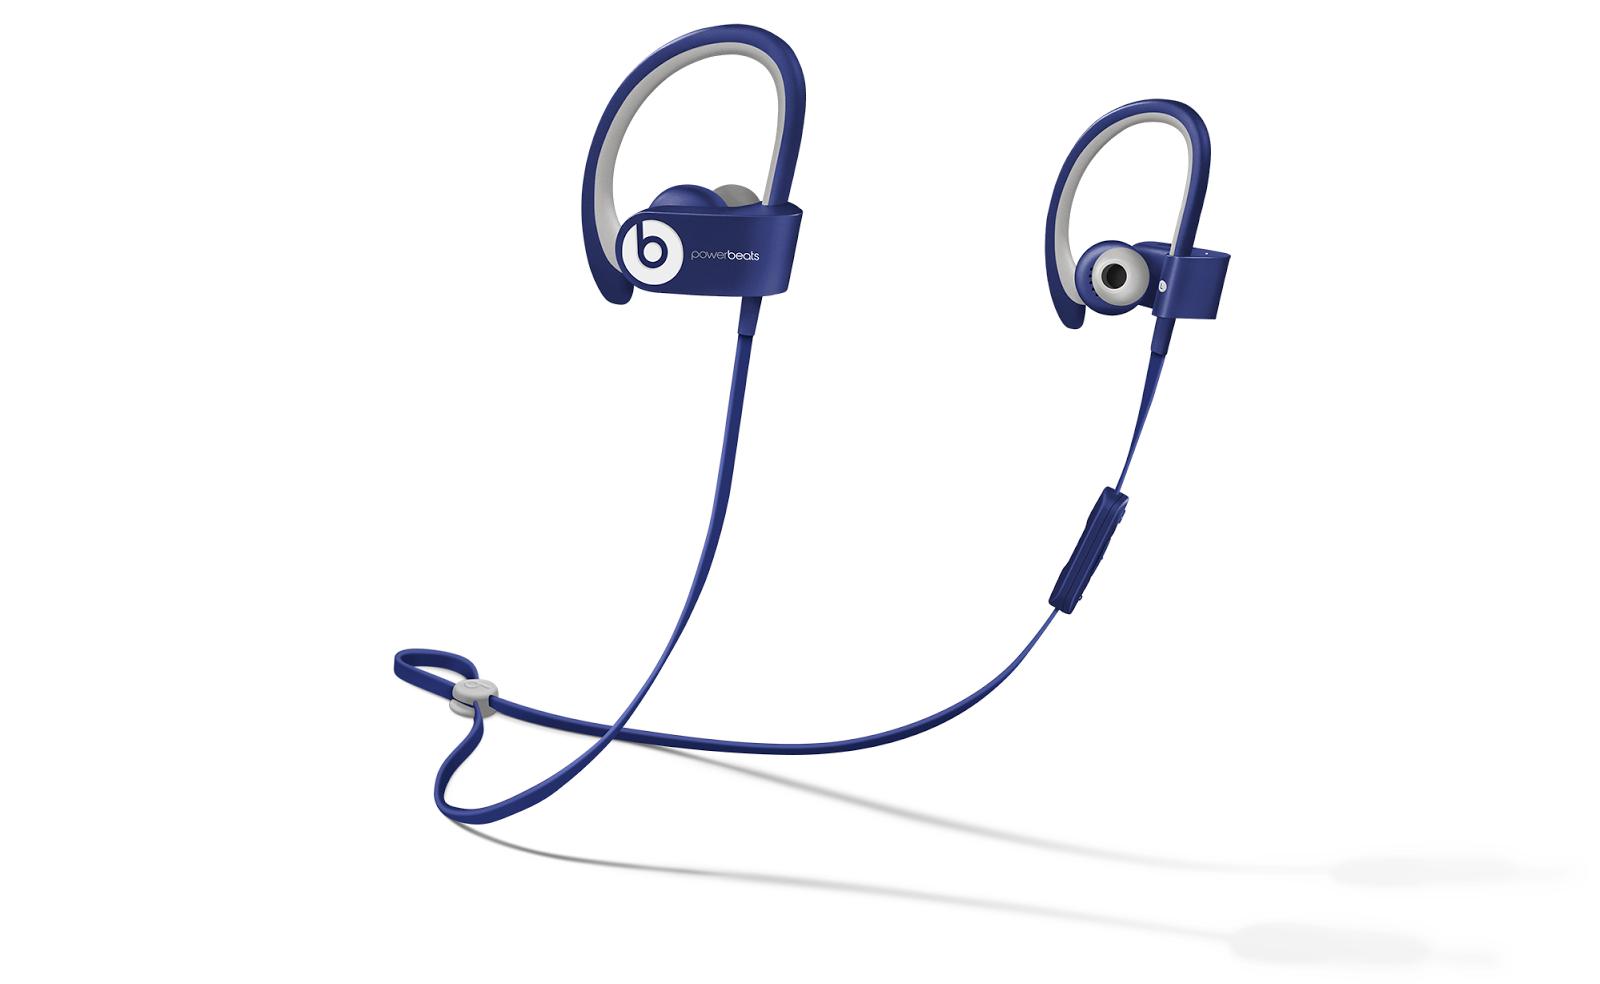 Powerbeats2 Wireless Headphones